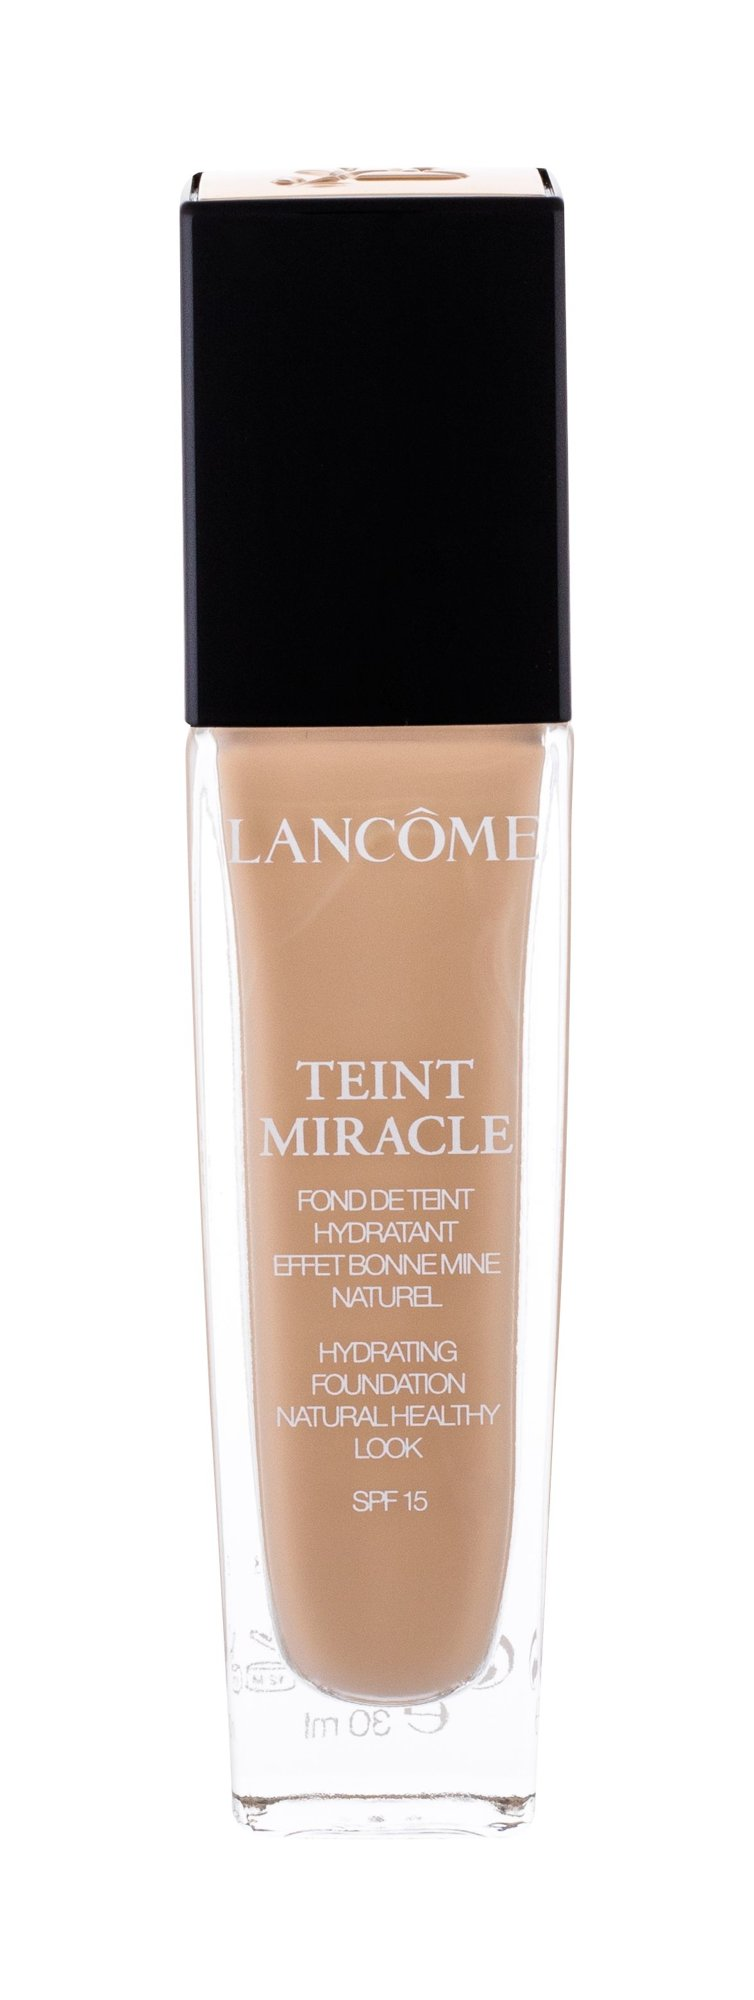 Lancôme Teint Miracle Makeup 30ml 010